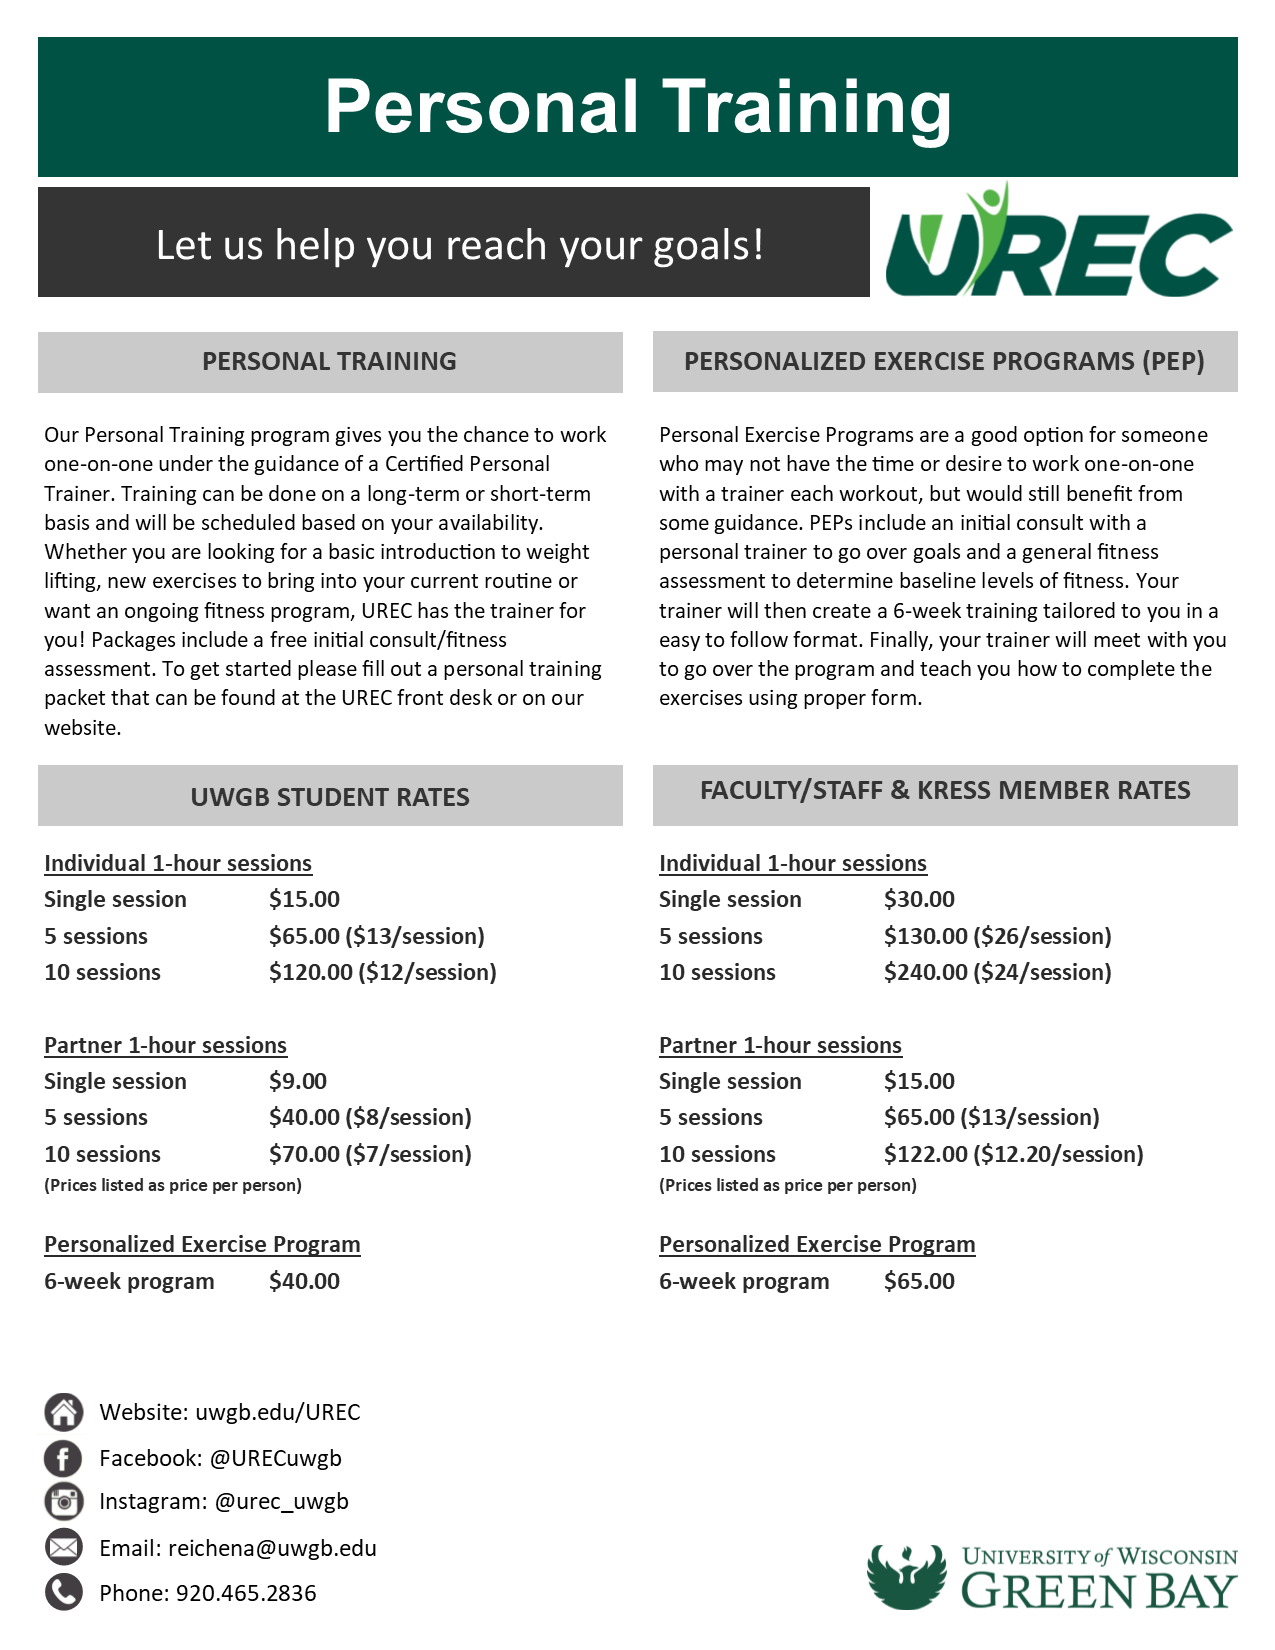 Personal Training - Fitness - UREC - UW-Green Bay